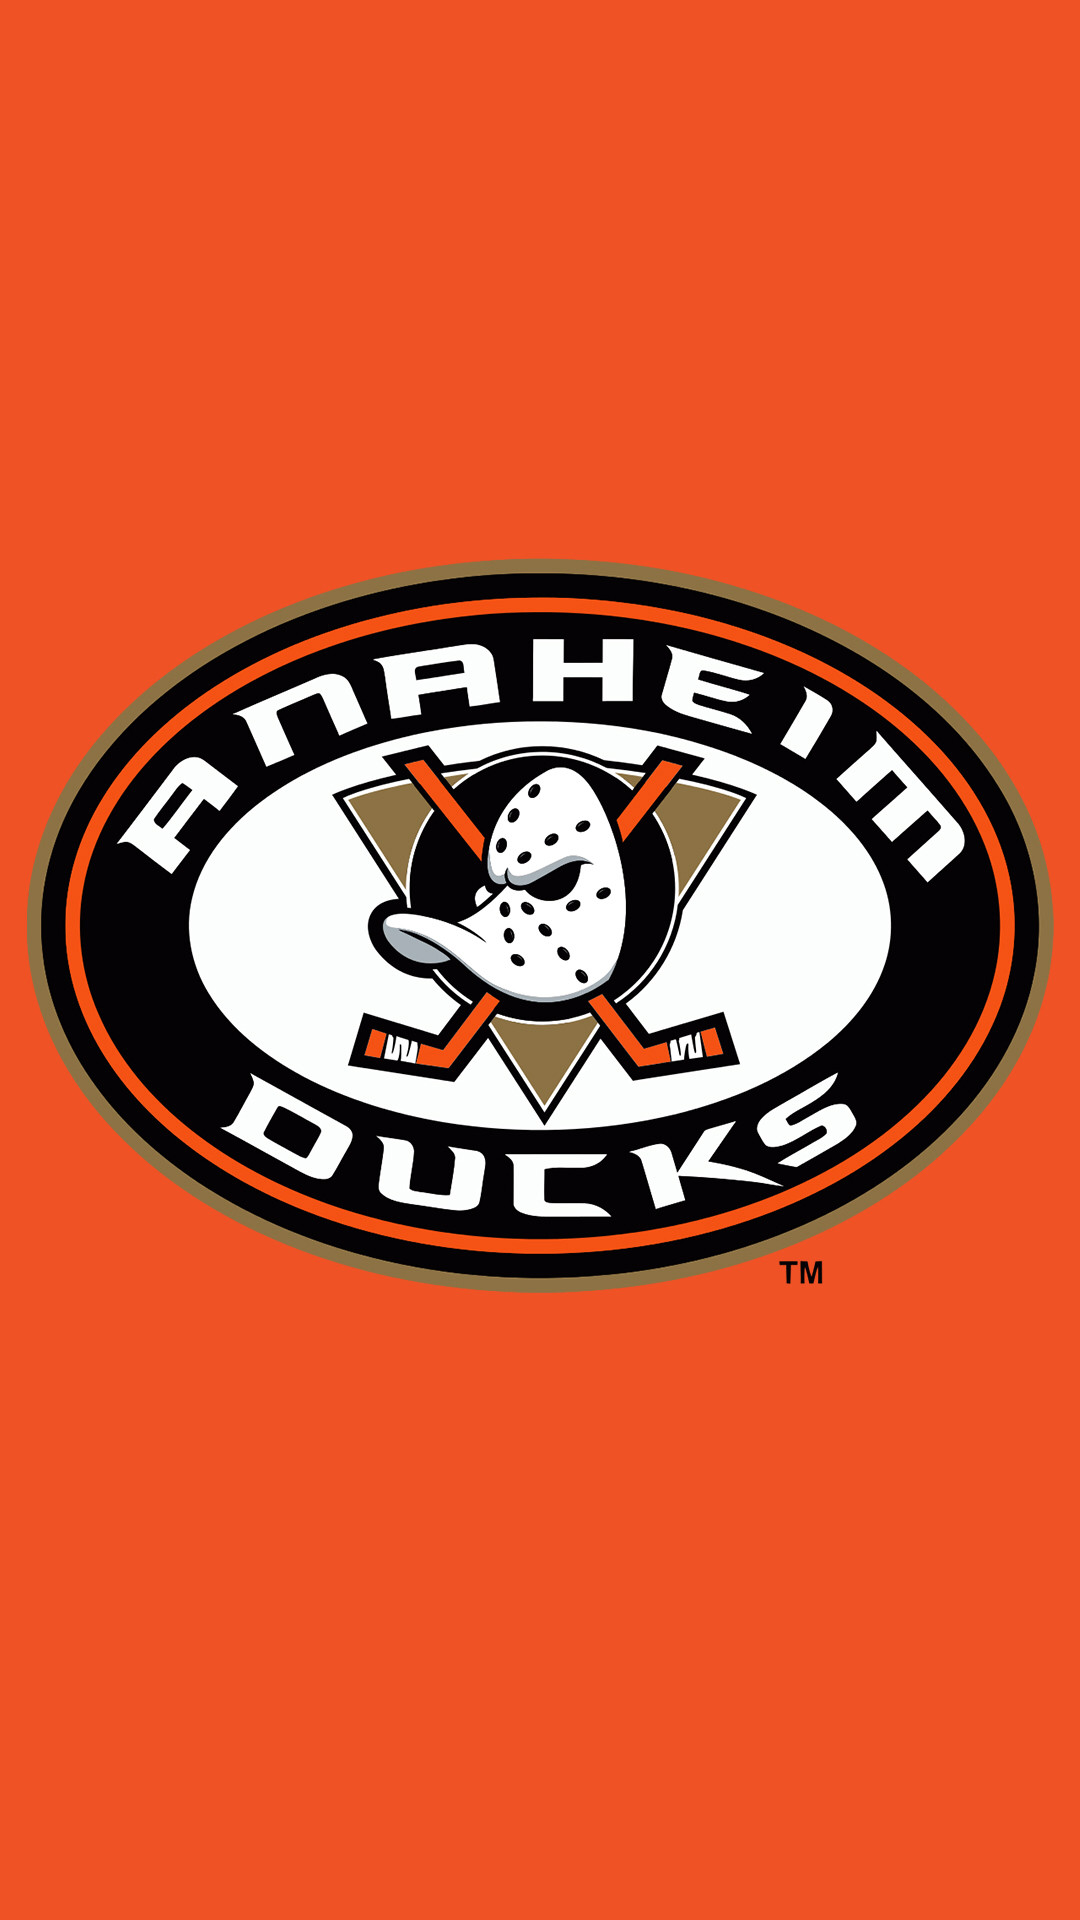 Anaheim Ducks iPhone 6 plus wallpaper created by me